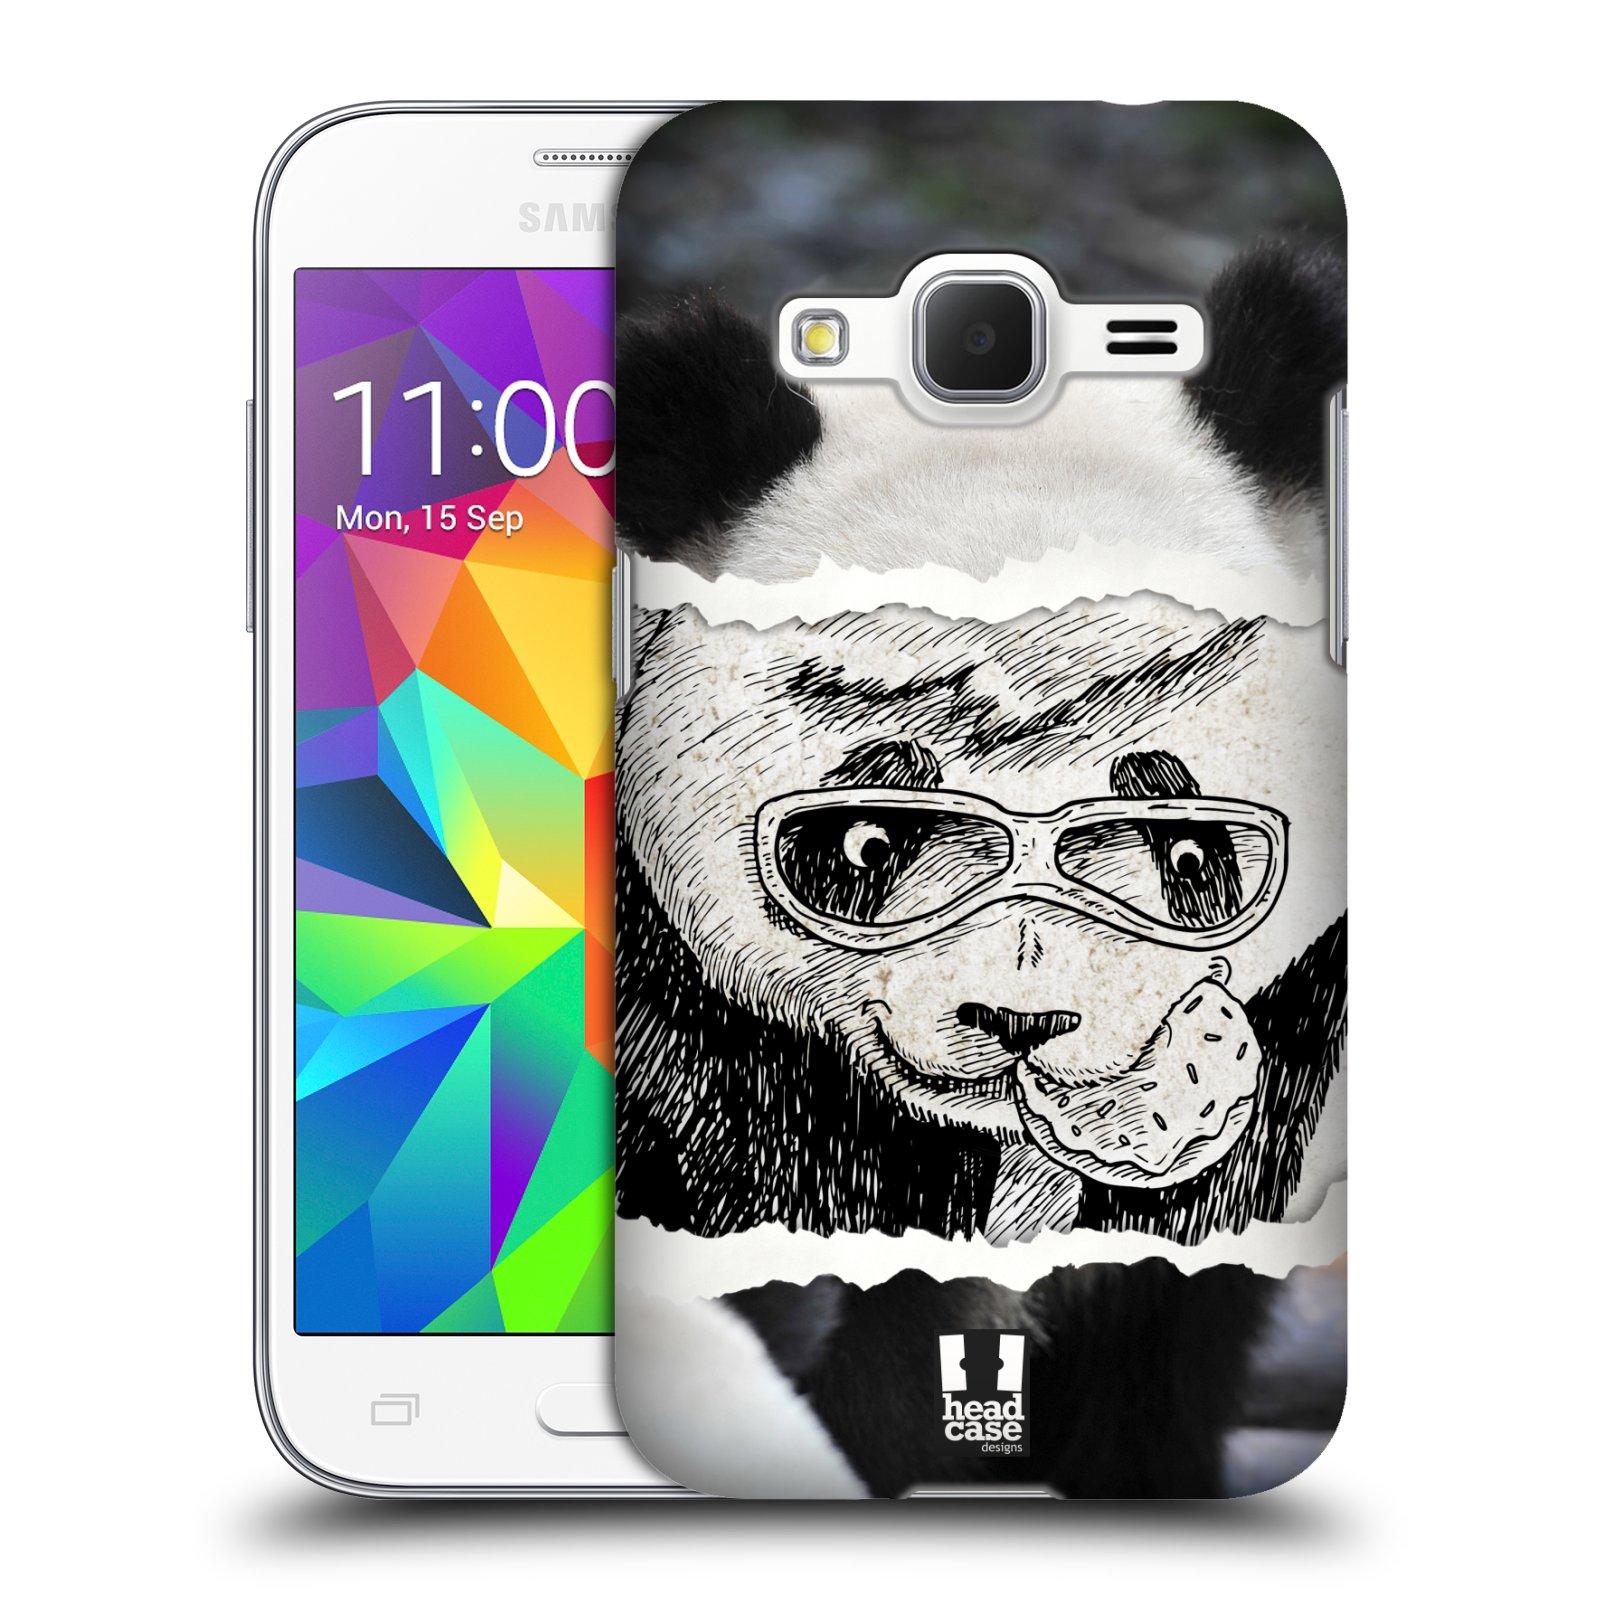 HEAD CASE plastový obal na mobil SAMSUNG GALAXY Core Prime (Core Prime VE) vzor zvířata koláž roztomilá panda